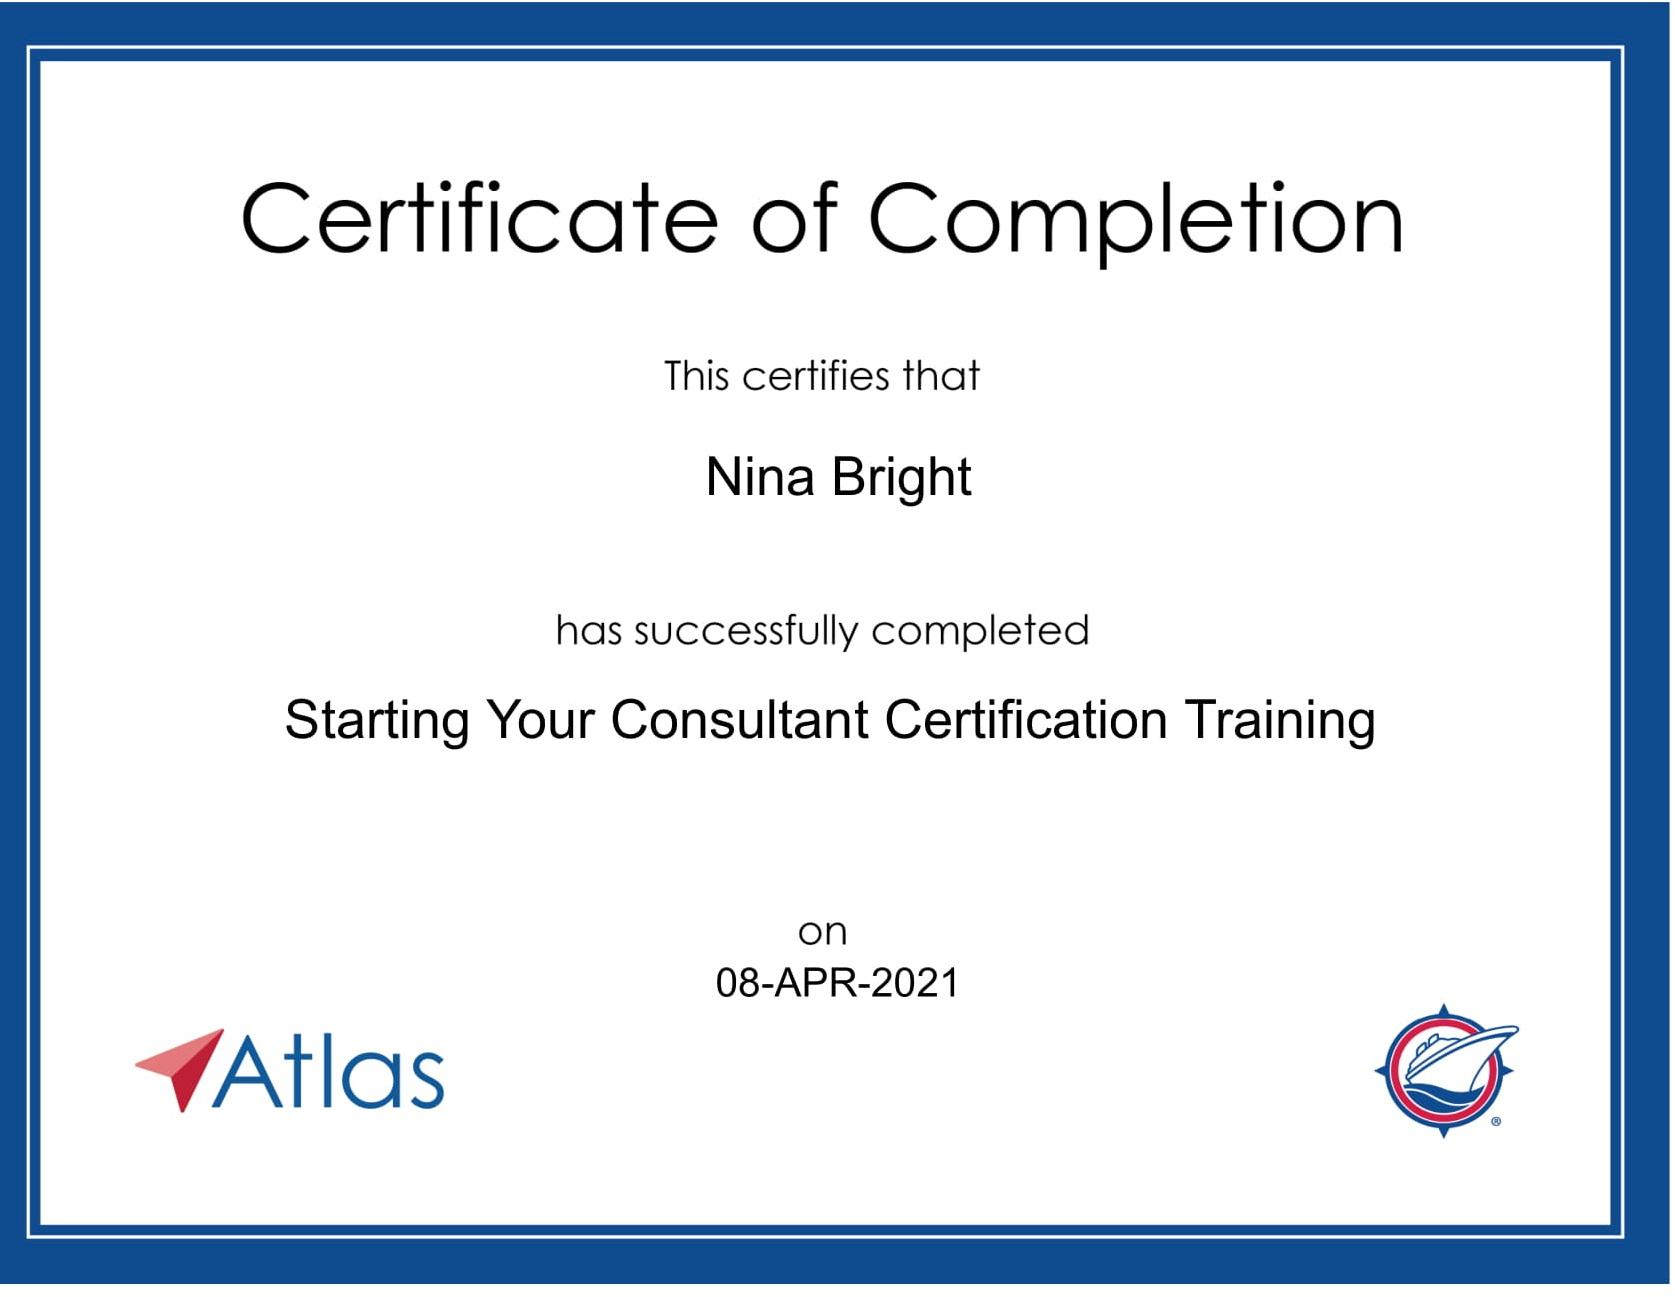 Atlas - Certificate - Starting Training-1